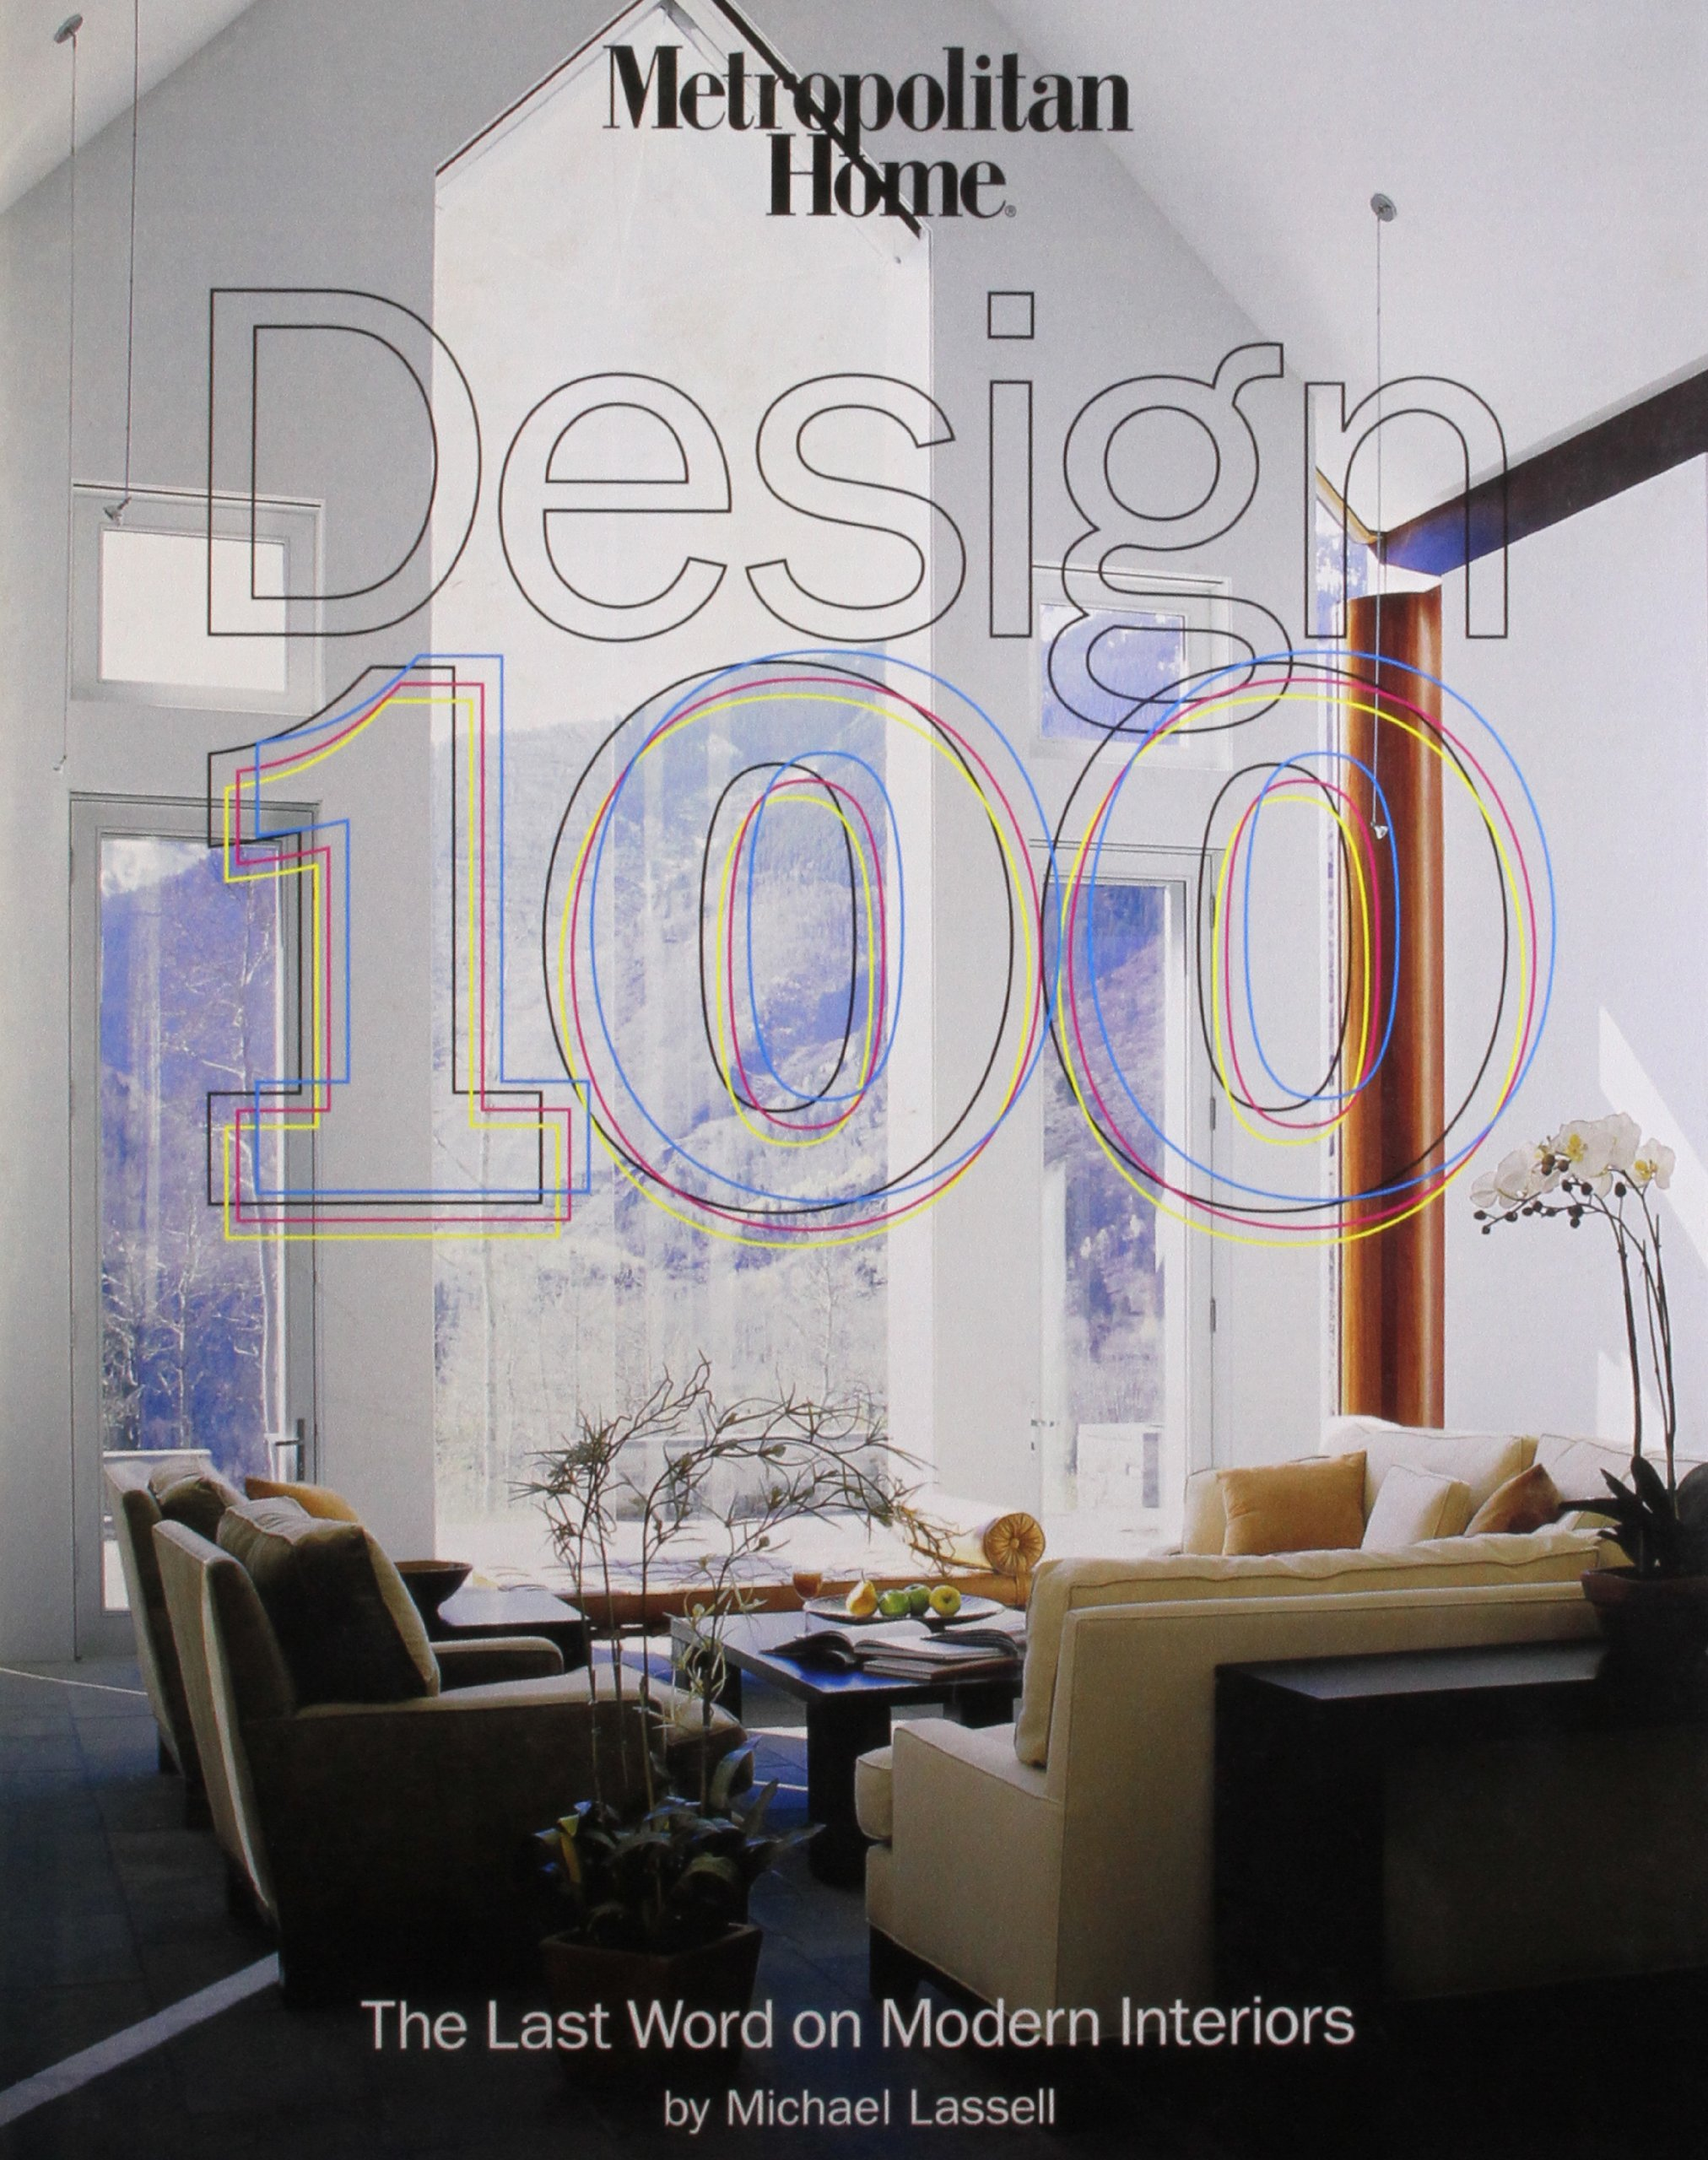 Metropolitan Home Design 100: The Last Word on Modern Interiors